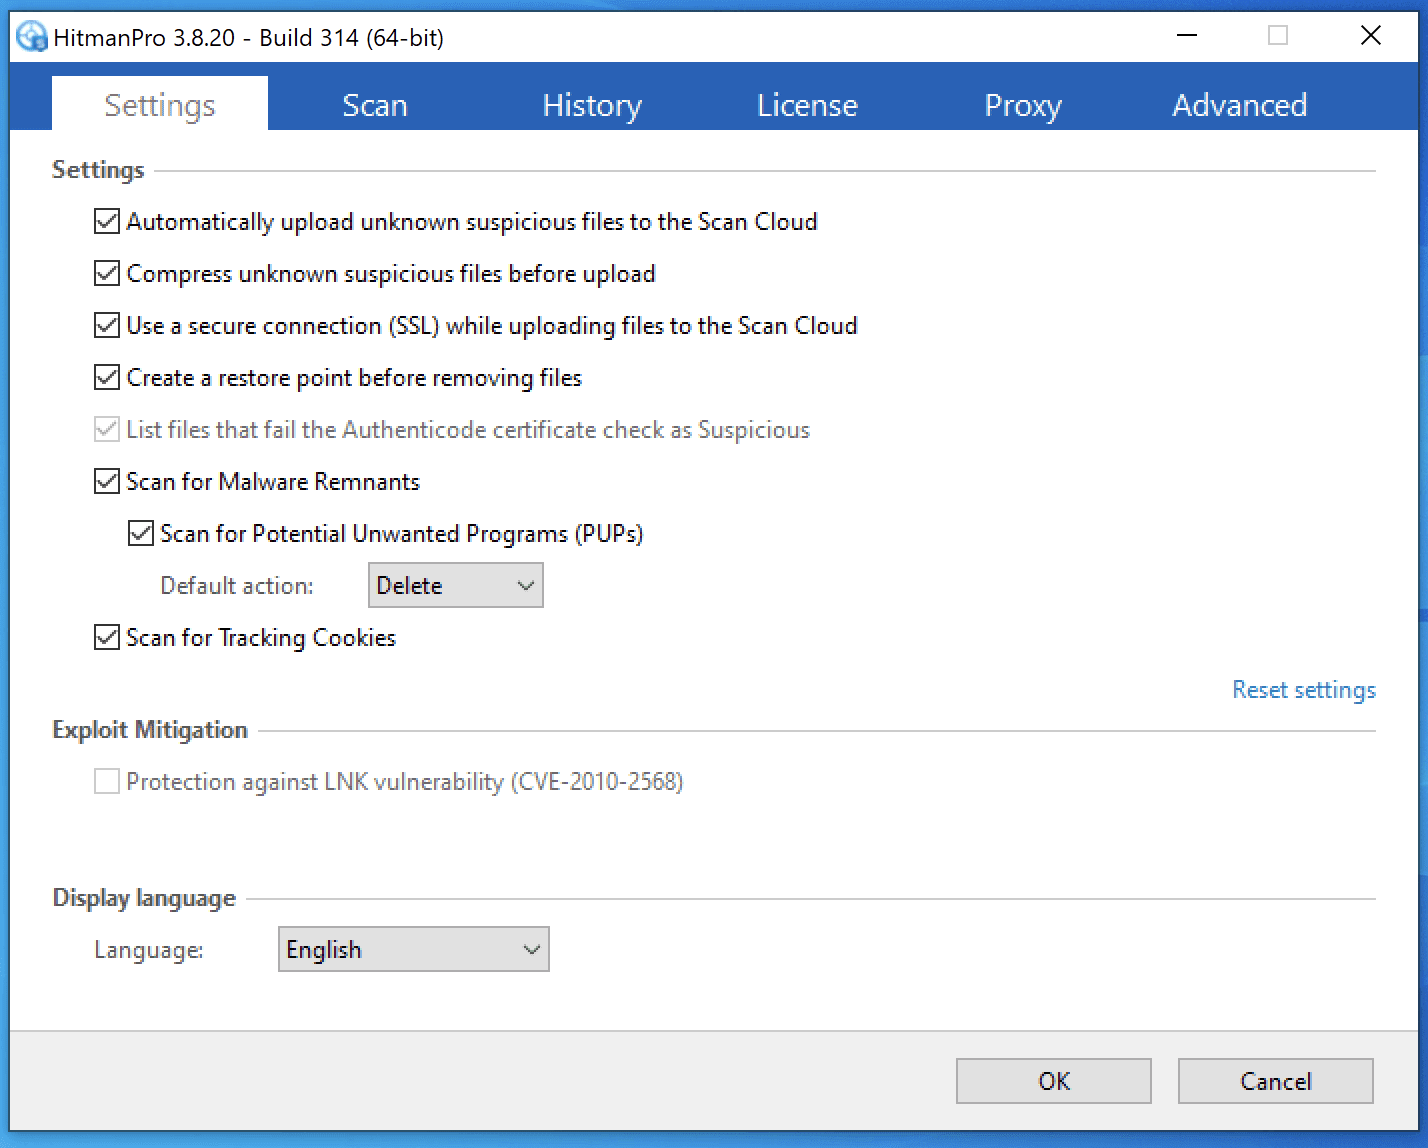 HitmanPro Settings Screenshot